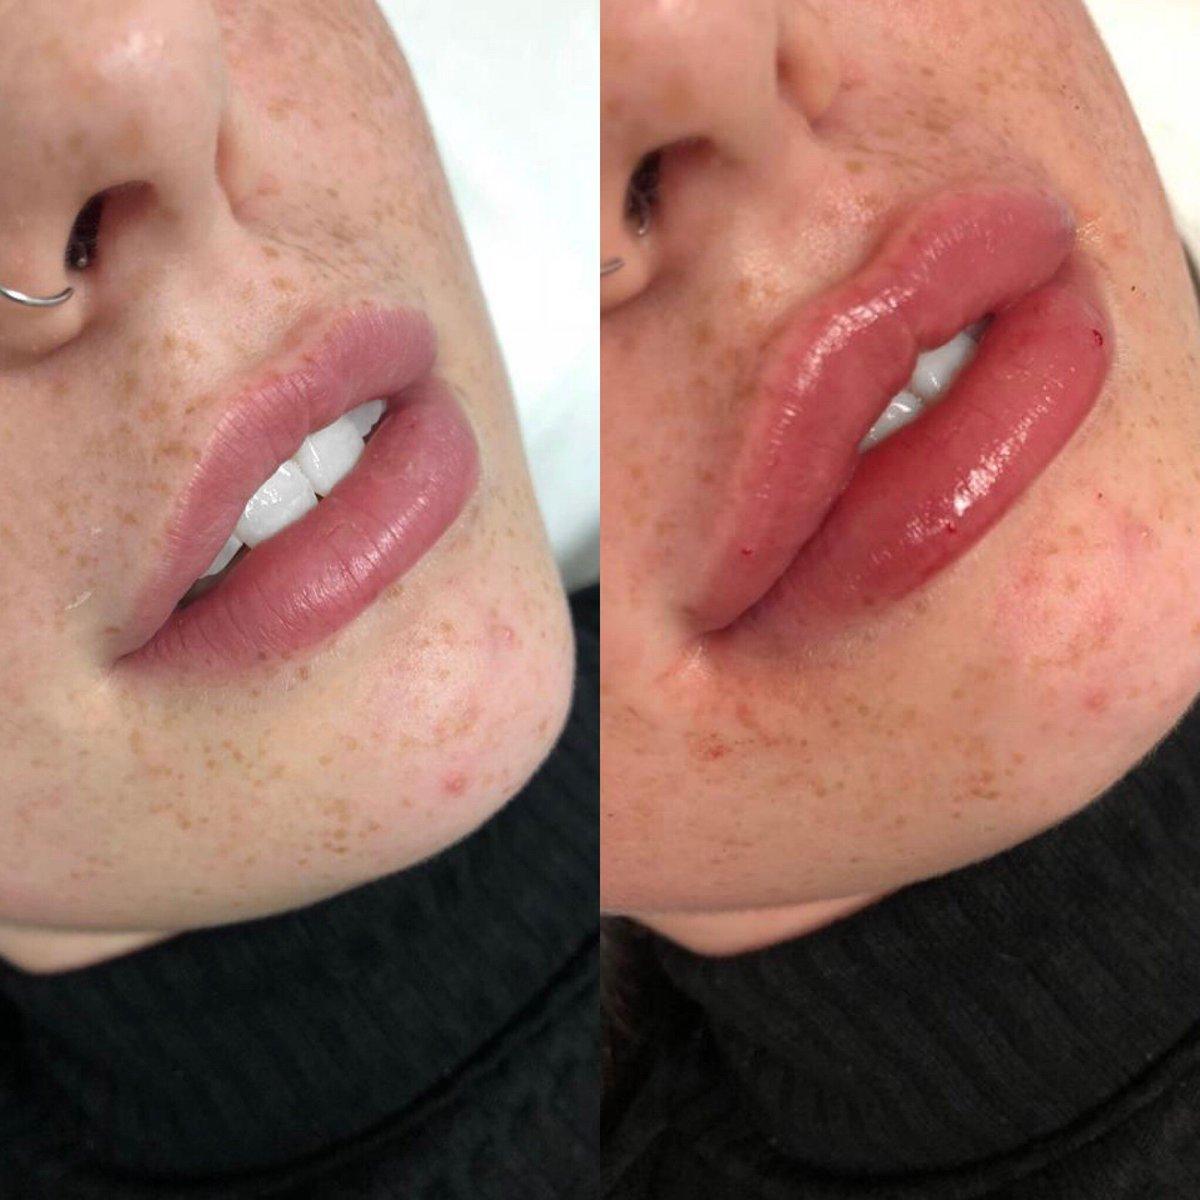 Cosmetic Aesthetics on Twitter: